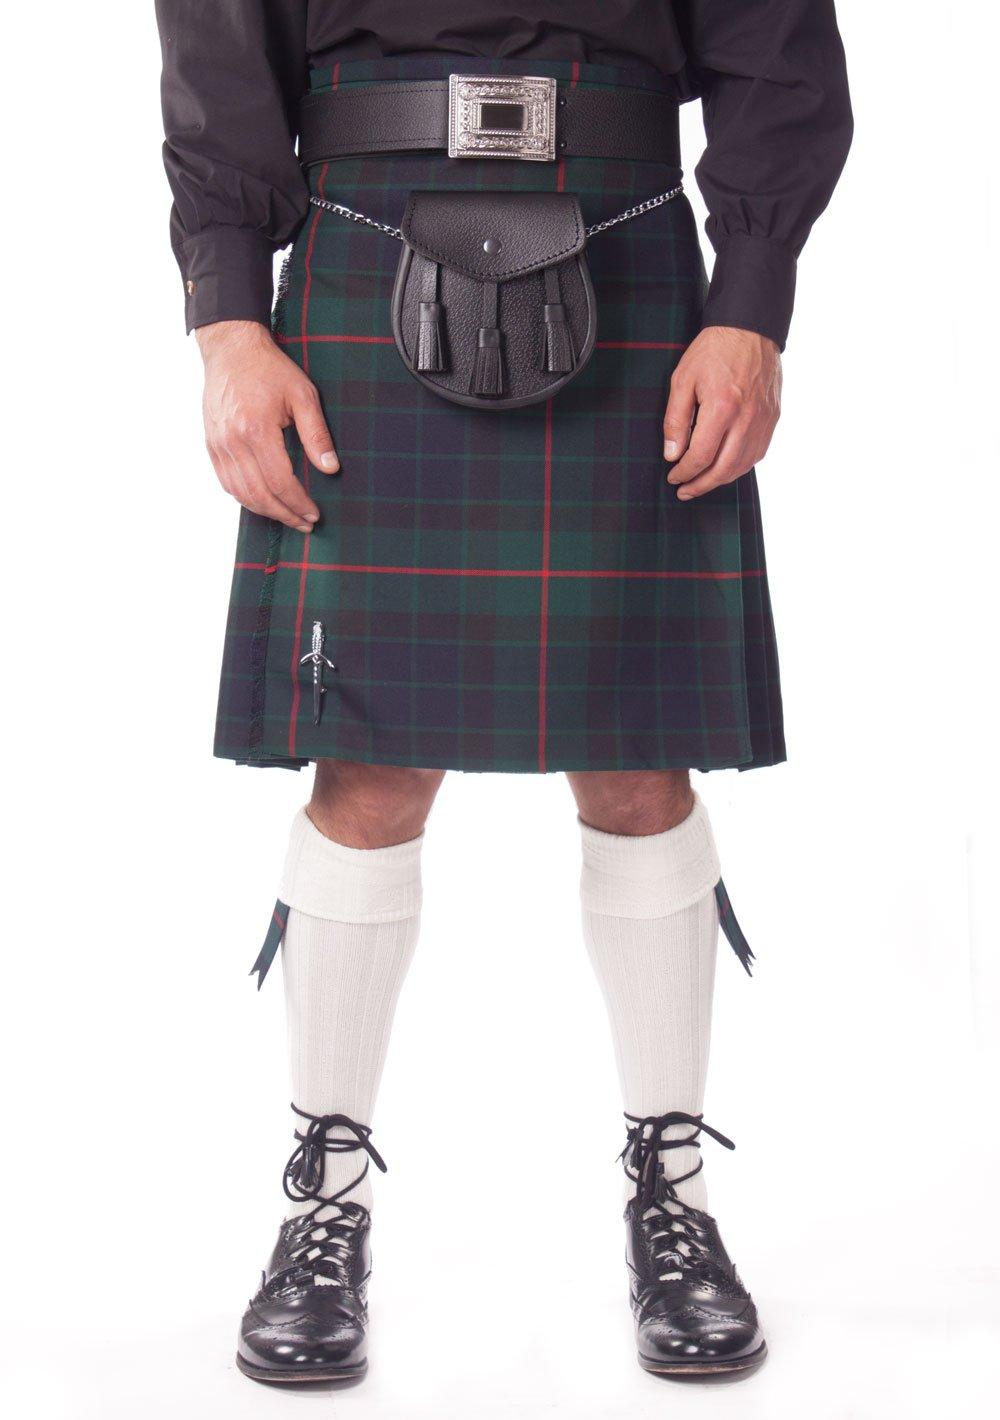 Kilt Society Mens 7 Piece Casual Kilt Outfit- Gunn Tartan with White Hose 46'' to 50''